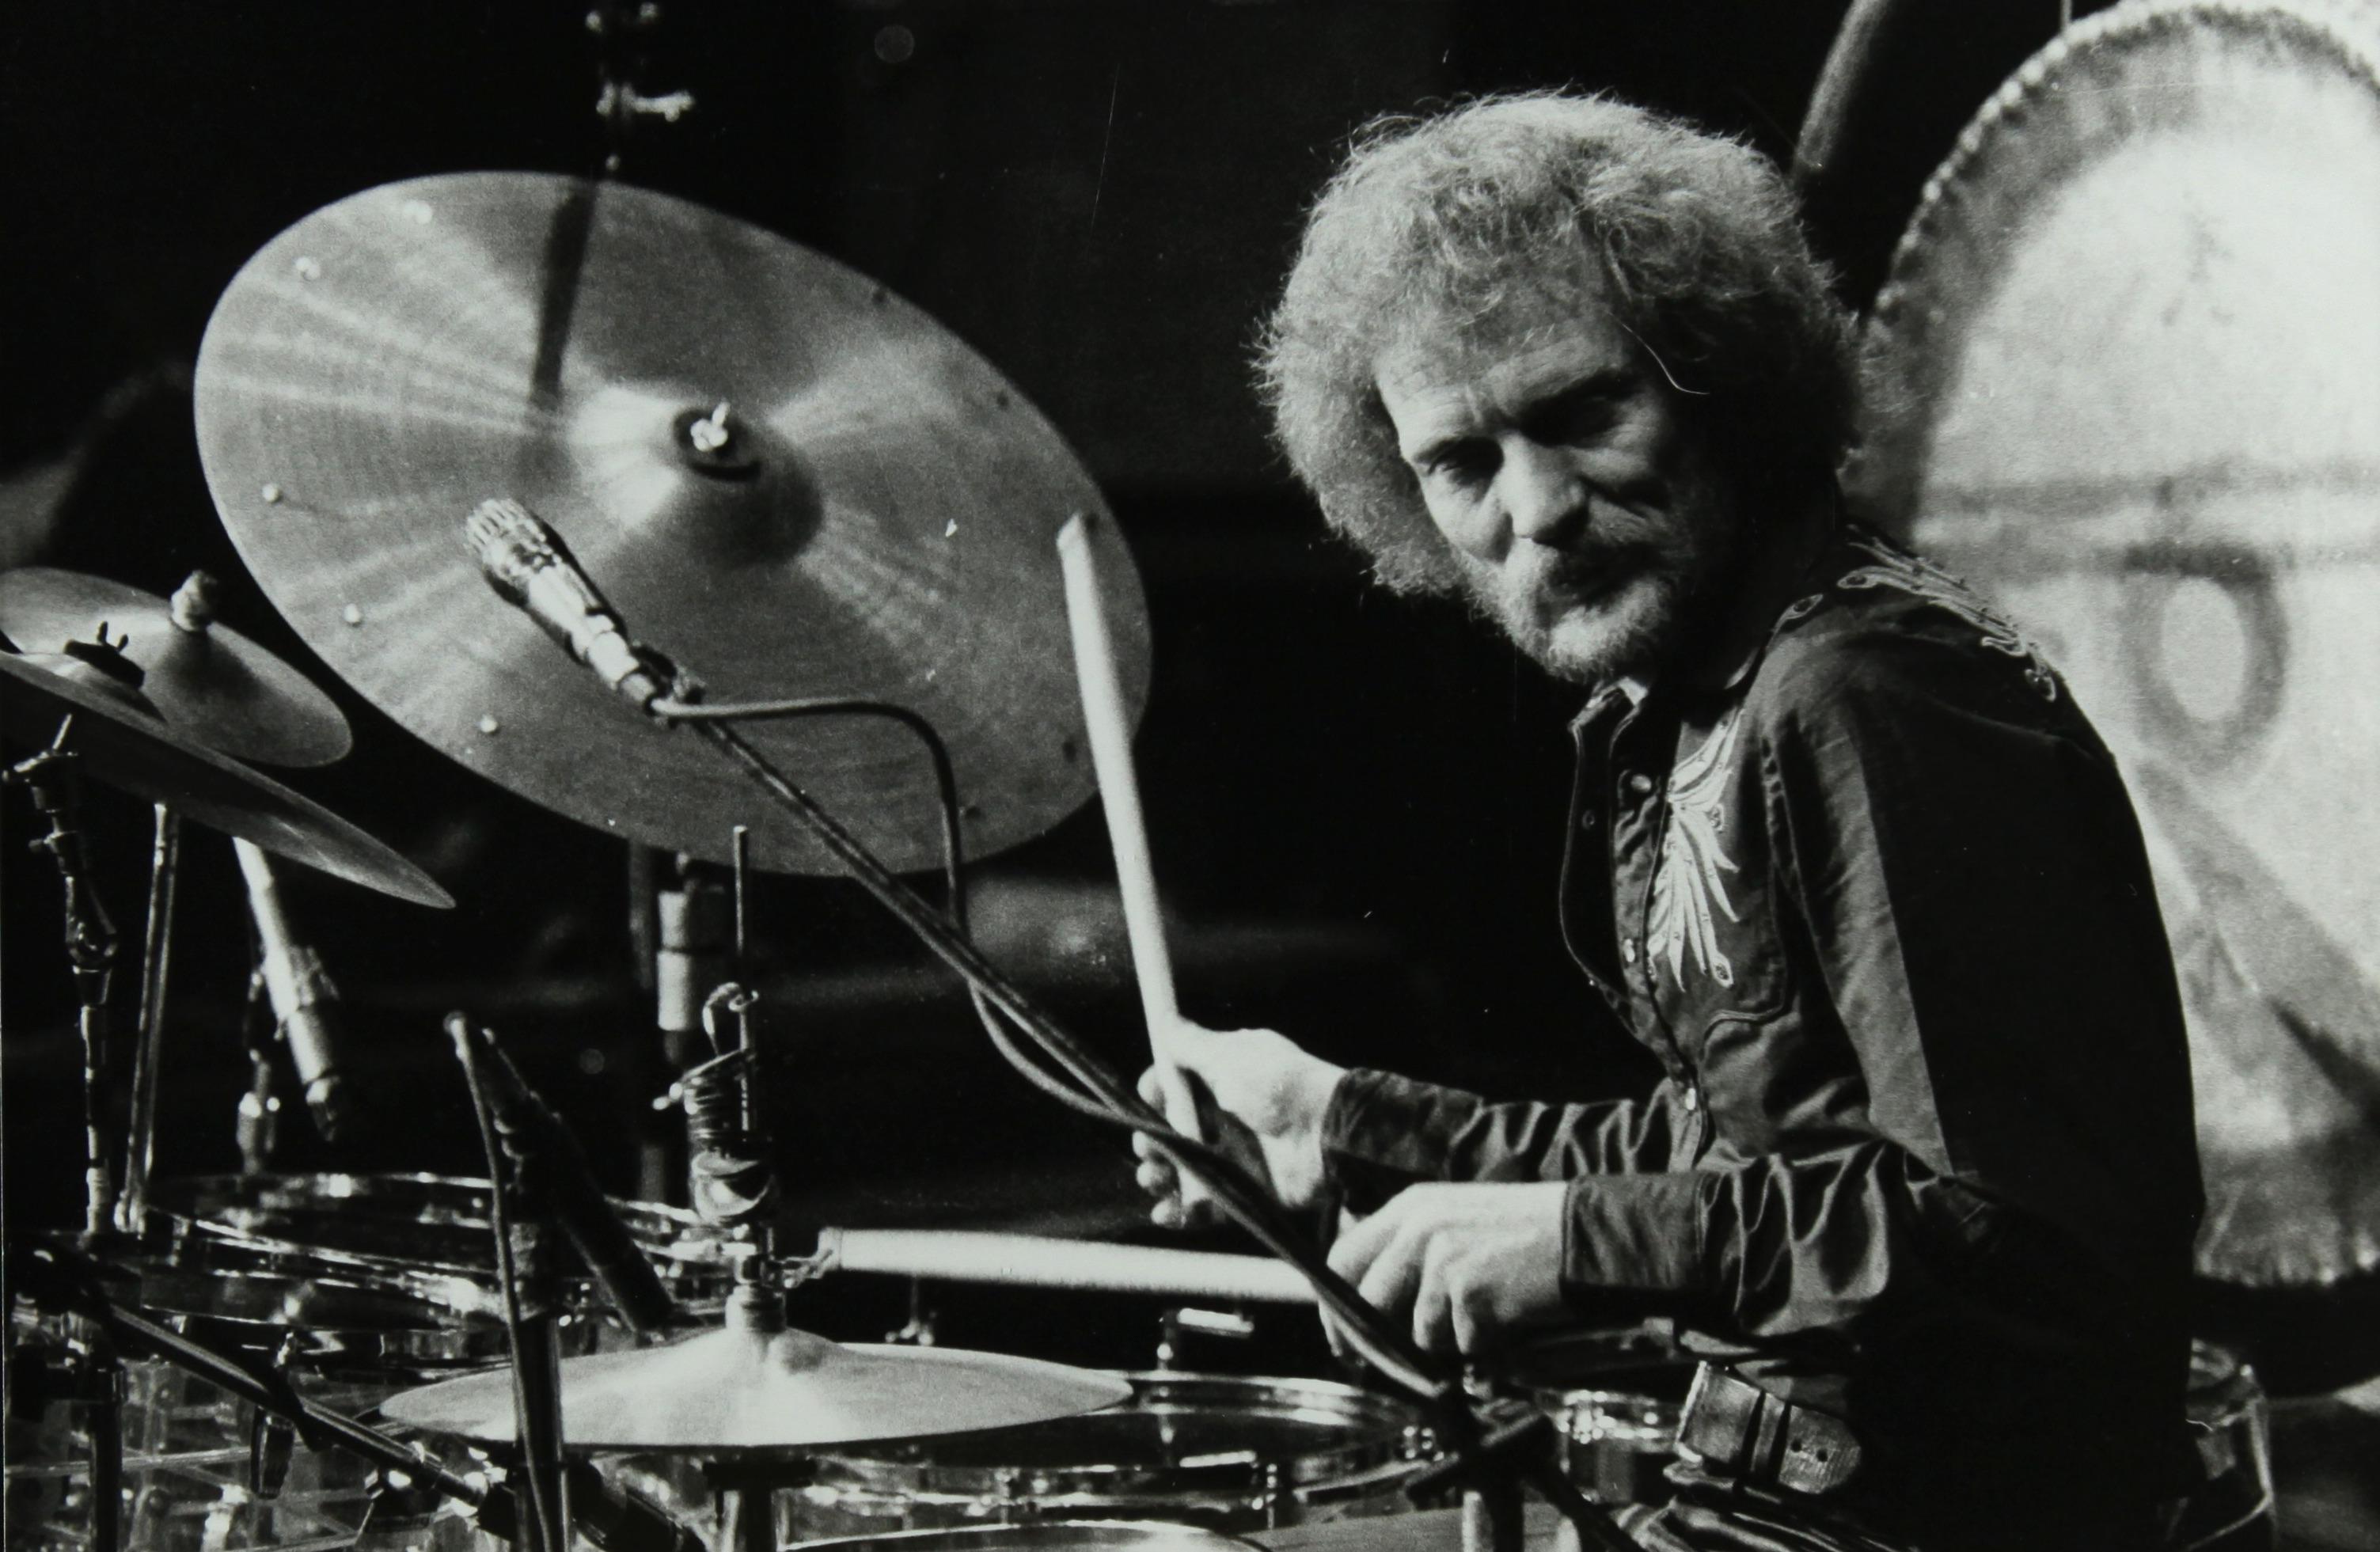 ginger-baker-cream-drummer-dead-at-80-obit